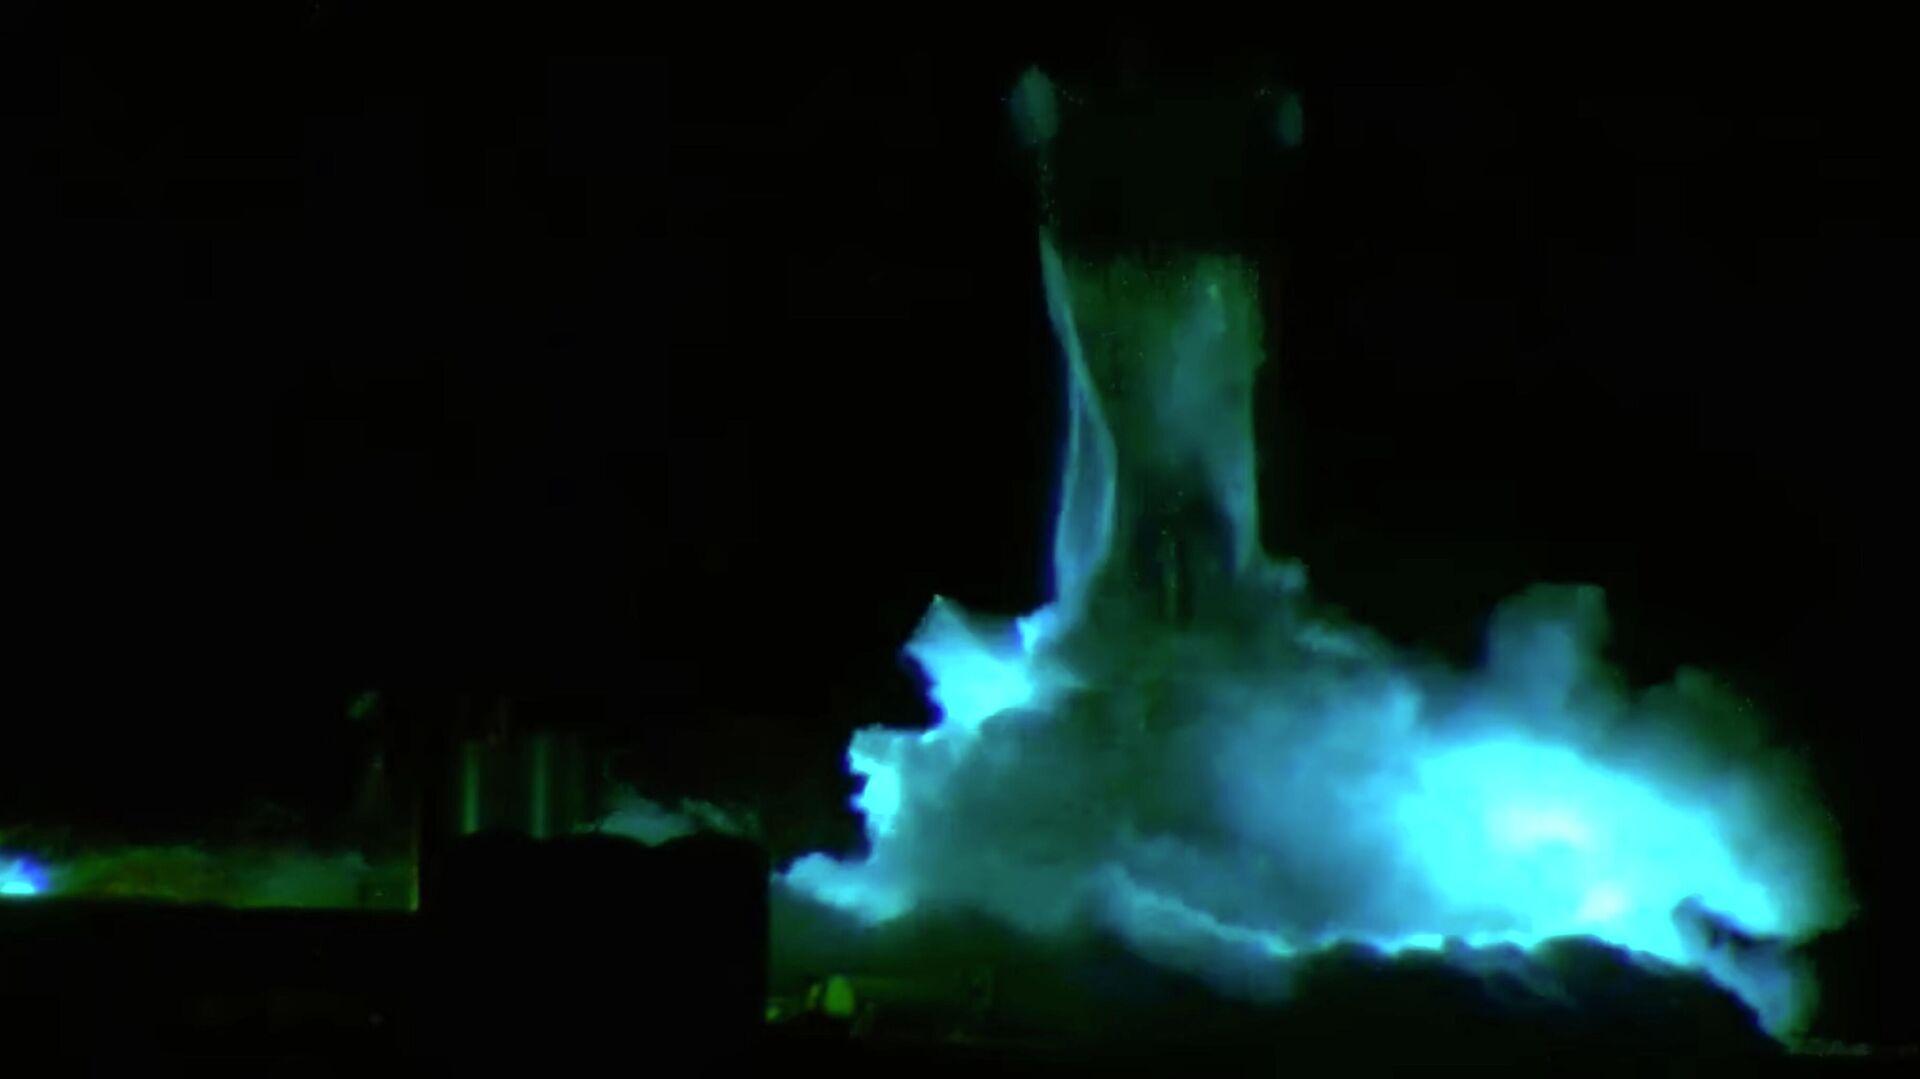 Прототип корабля Starship SN1 во время испытаний в Техасе, США. 28 февраля 2020 - РИА Новости, 1920, 13.09.2020